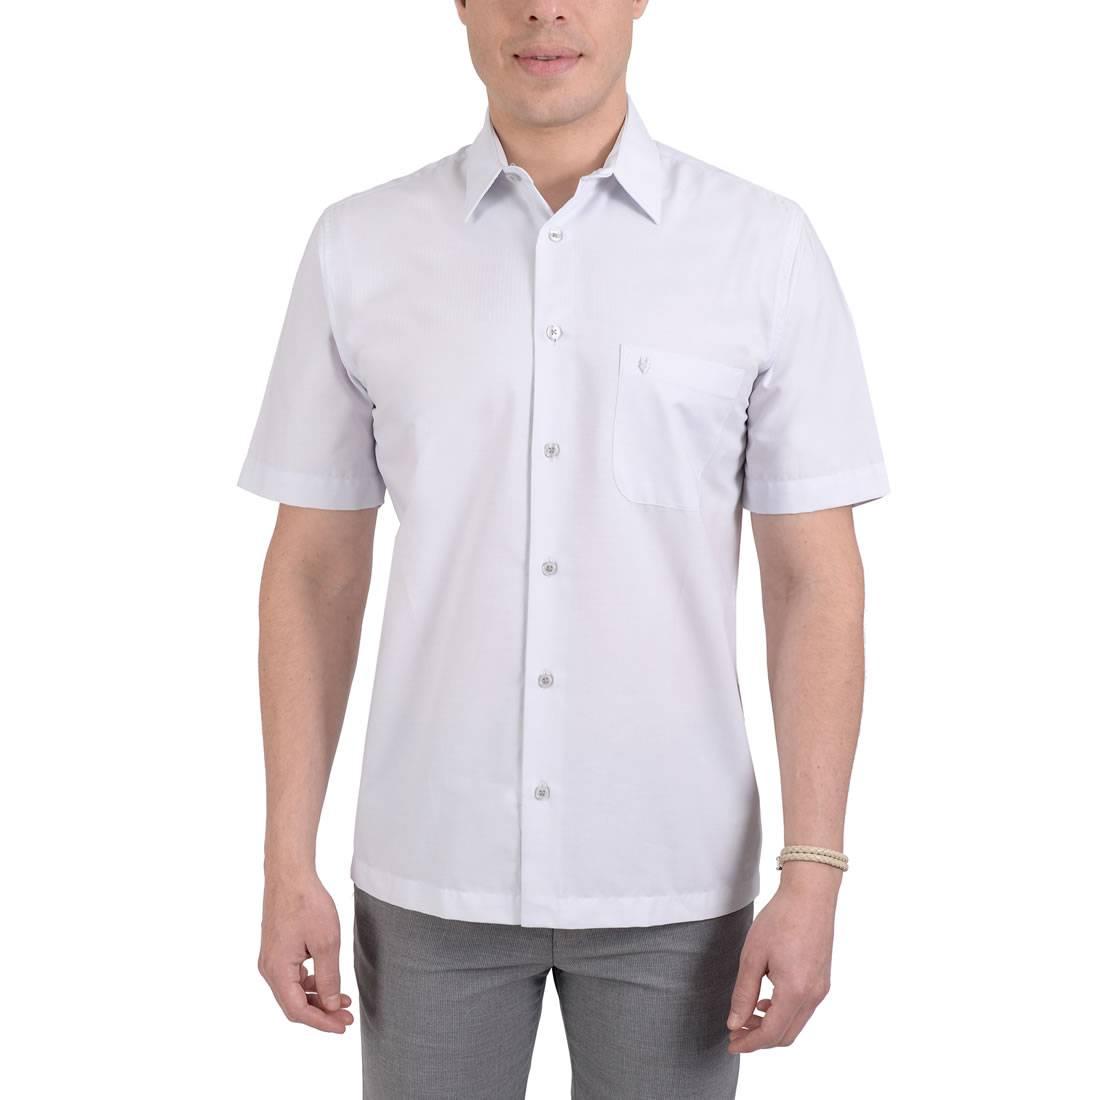 042379432106-01-Camisa-Casual-Manga-Corta-Classic-Fit-Gris-yale